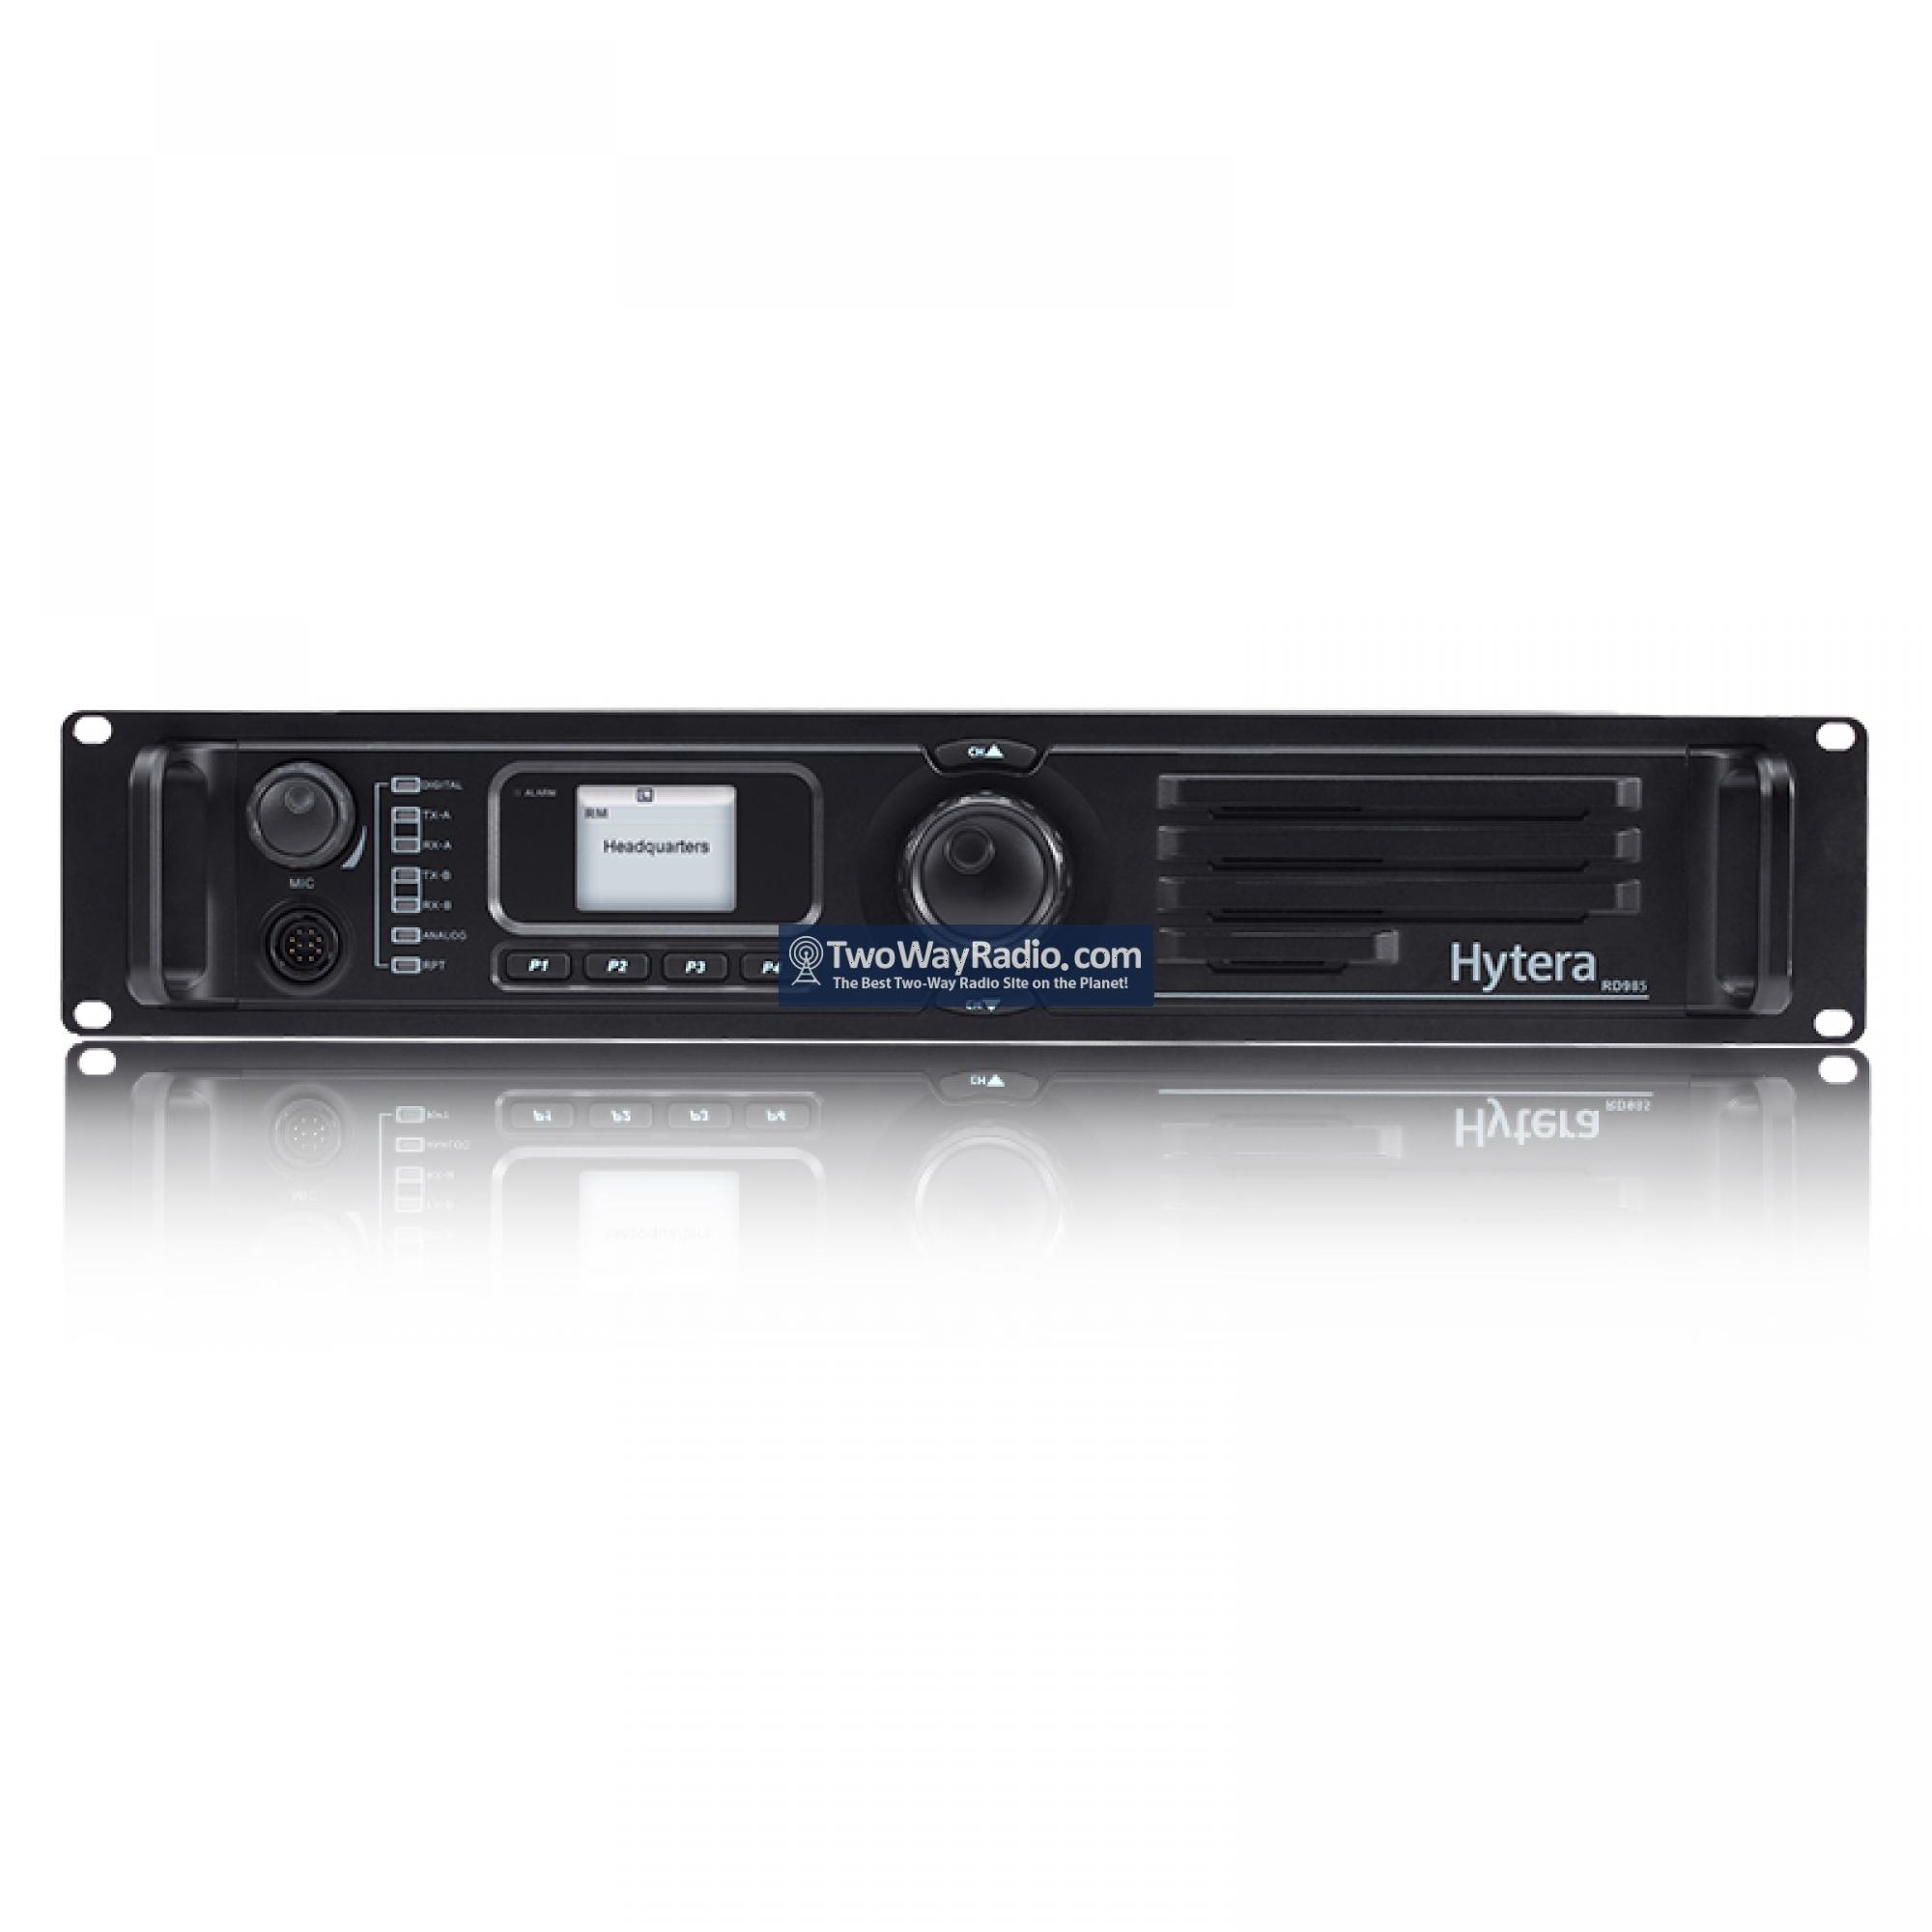 Buy Here | Hytera RD982i U1 Repeater - 2C, 50W Analog/Digital DMR